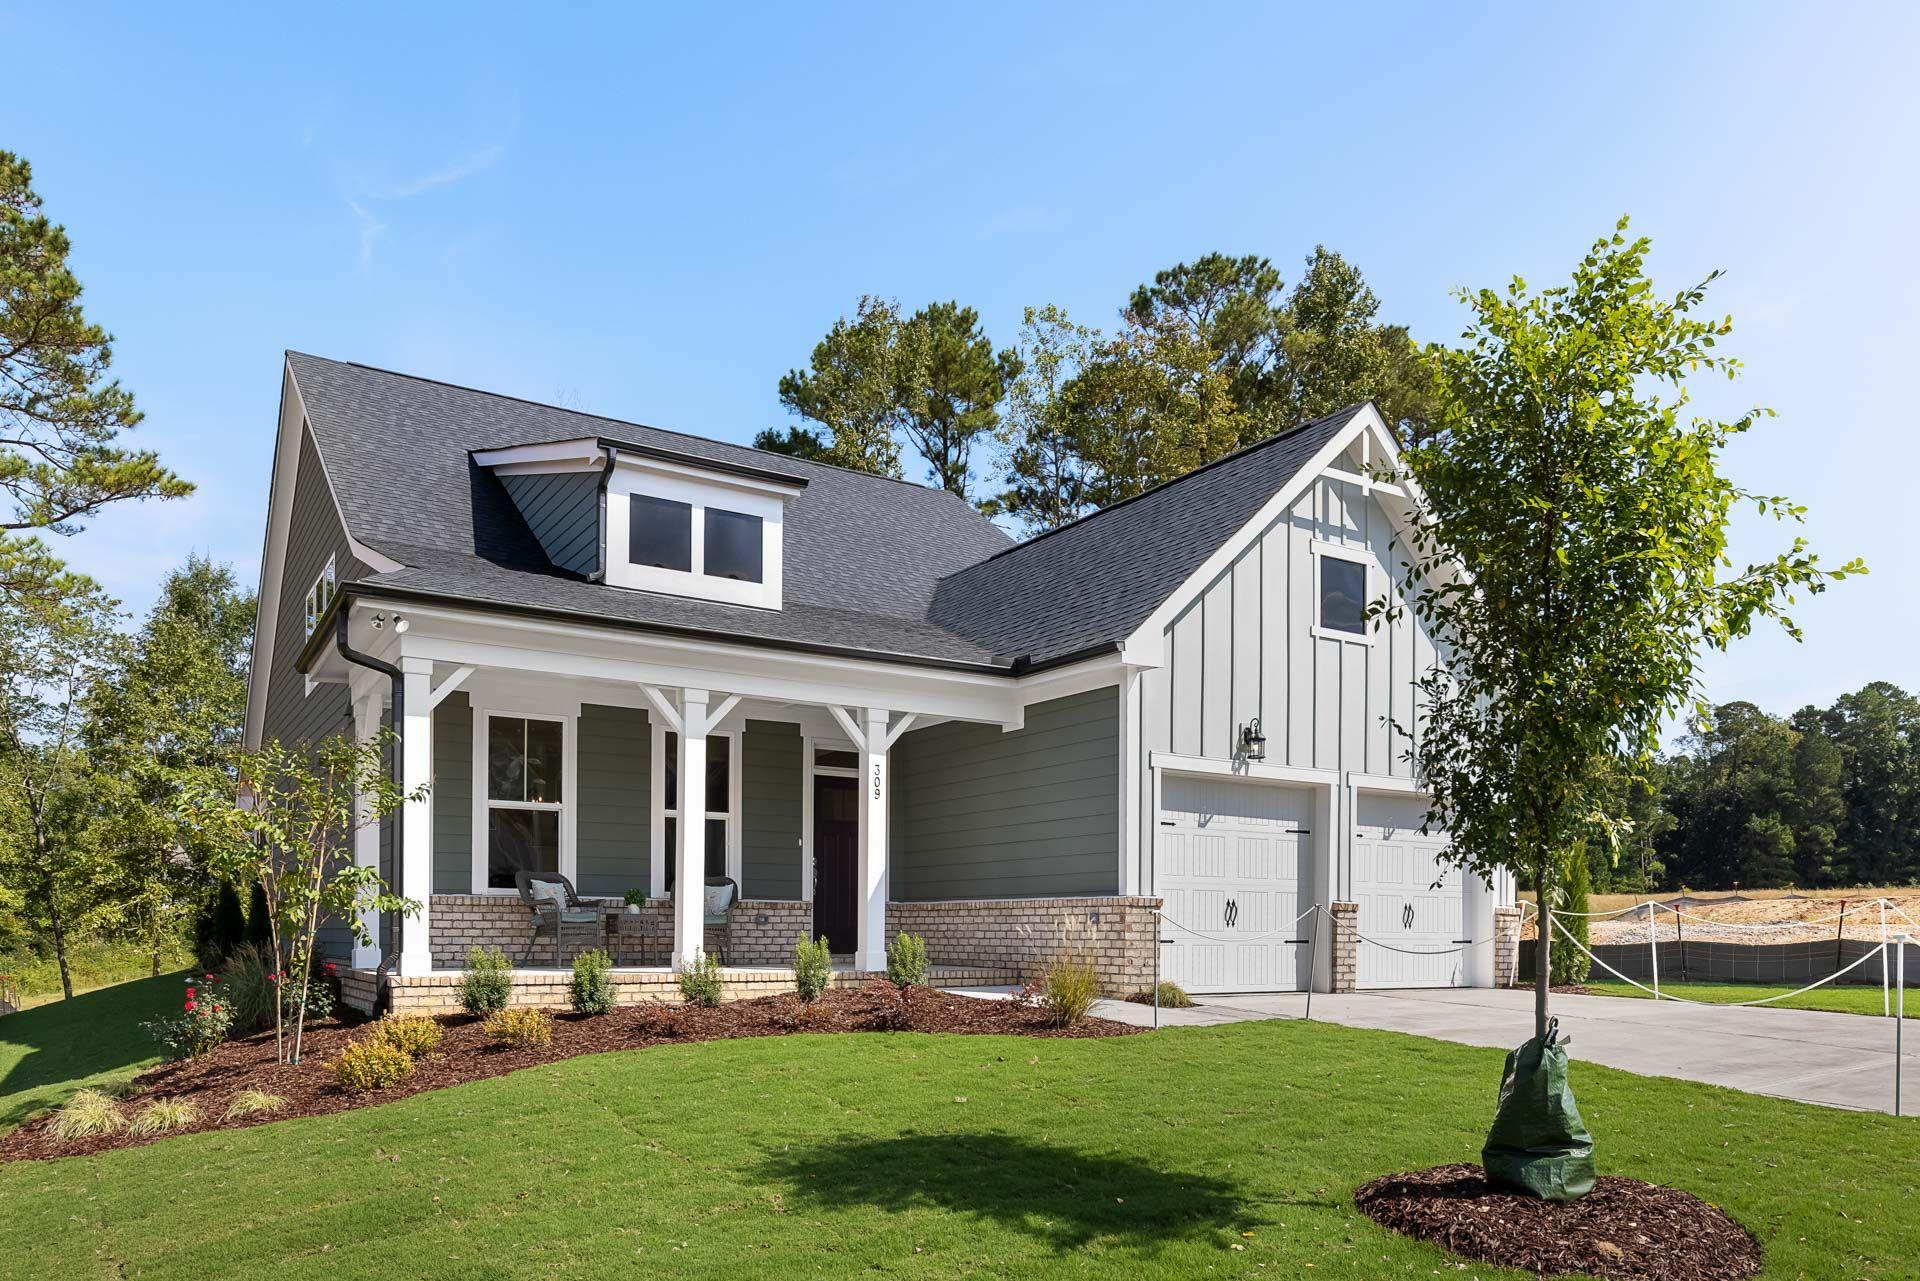 309-granite-acres:No Caption